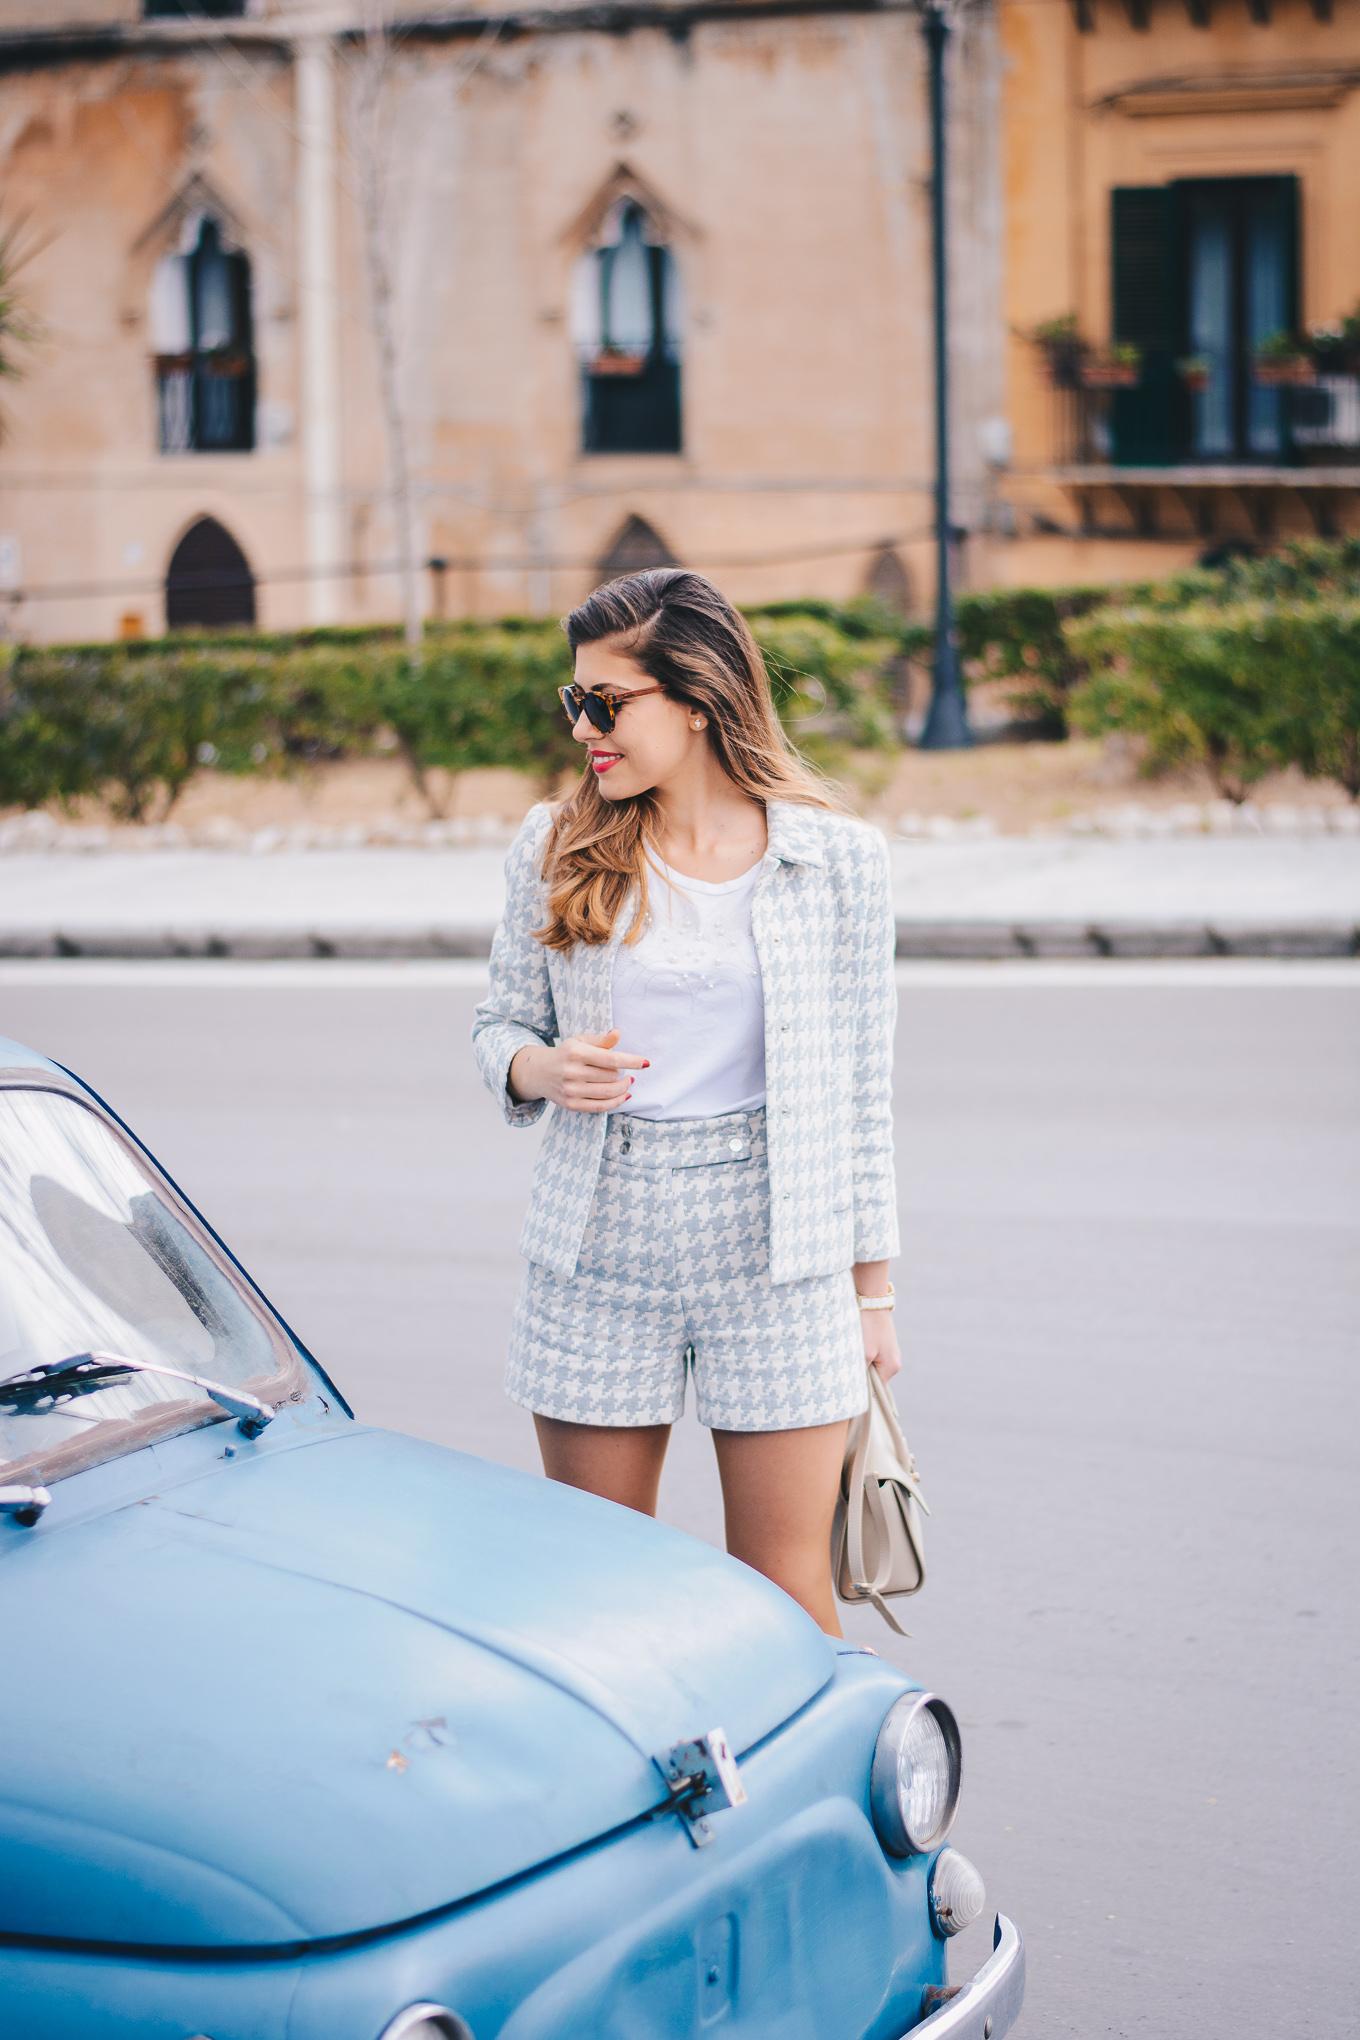 Style sicily blogger Denina Martin 032018